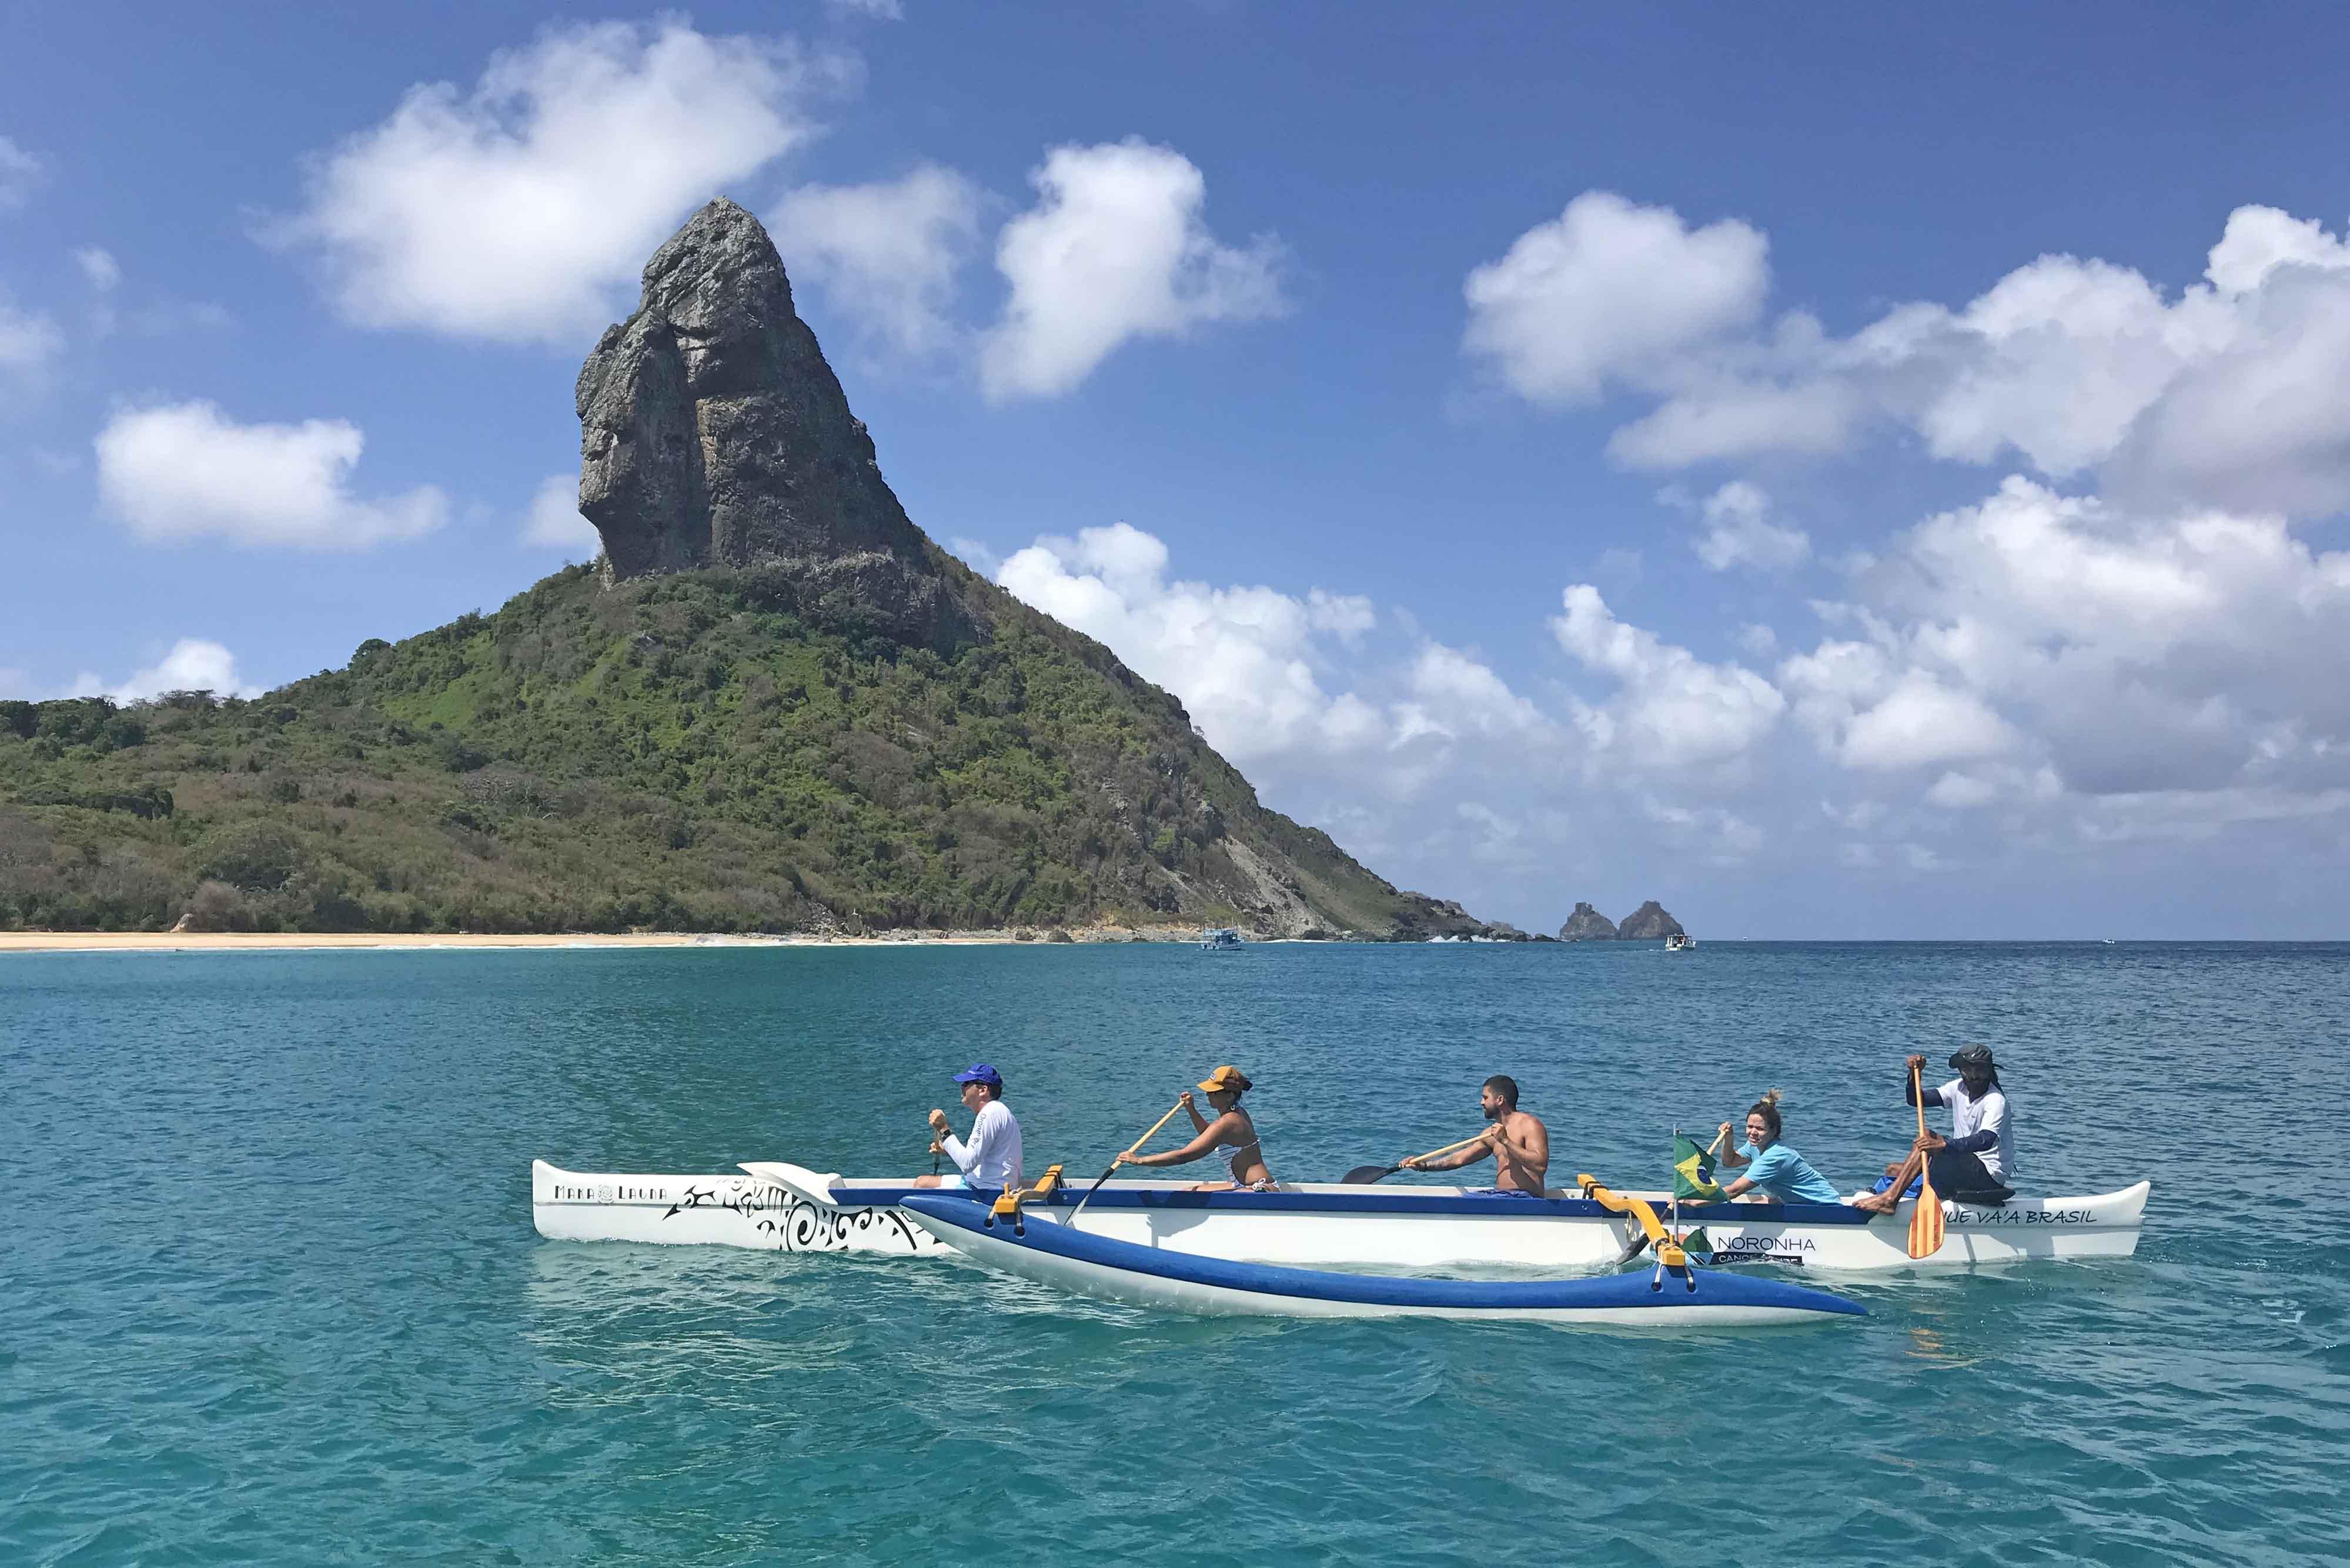 Passeio de canoa havaiana em Fernando de Noronha - Lala Rebelo